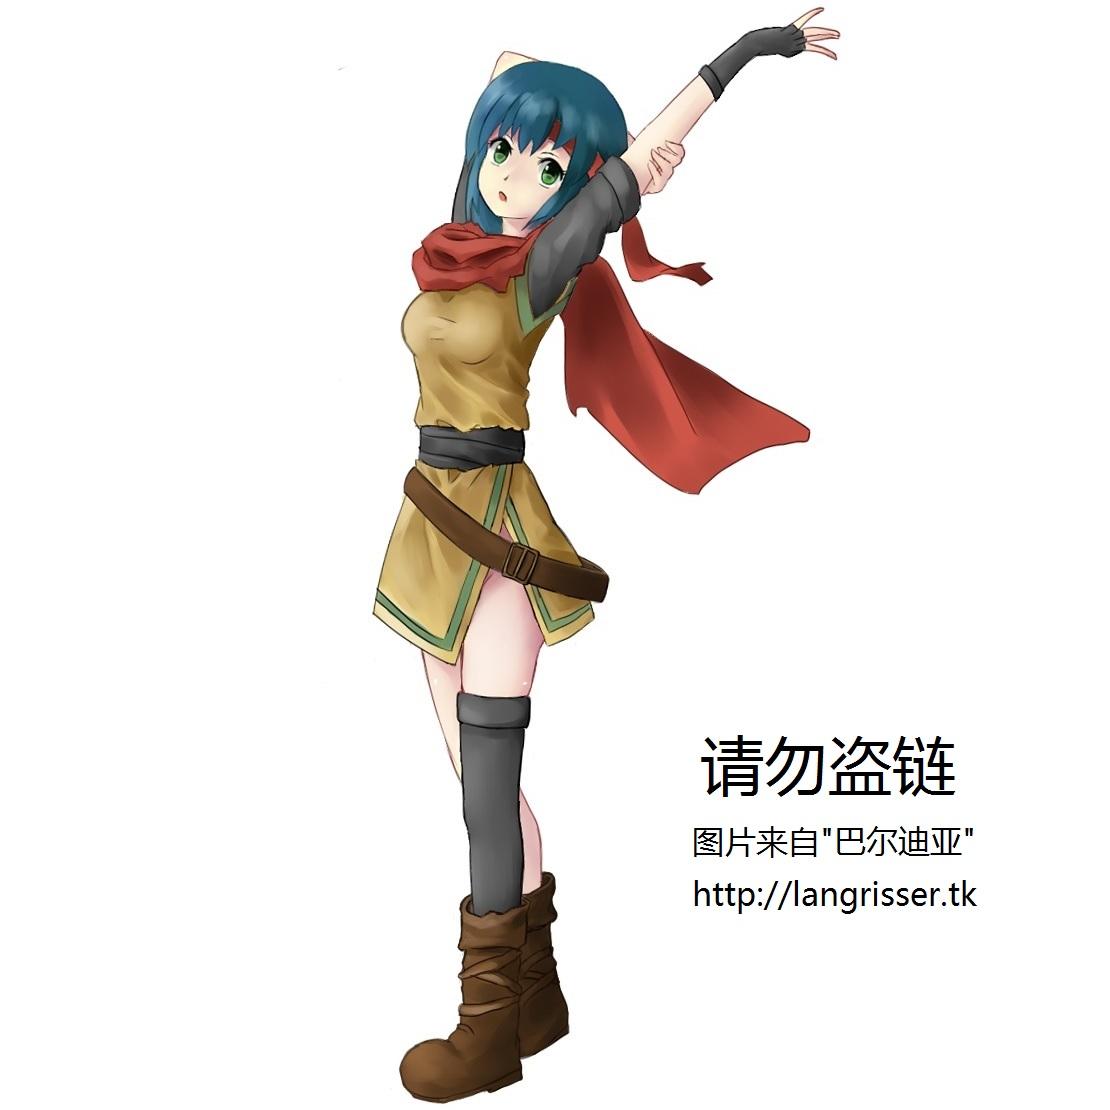 PS 梦幻模拟战 1&2 Plus Edition 汉化增值版V4.2